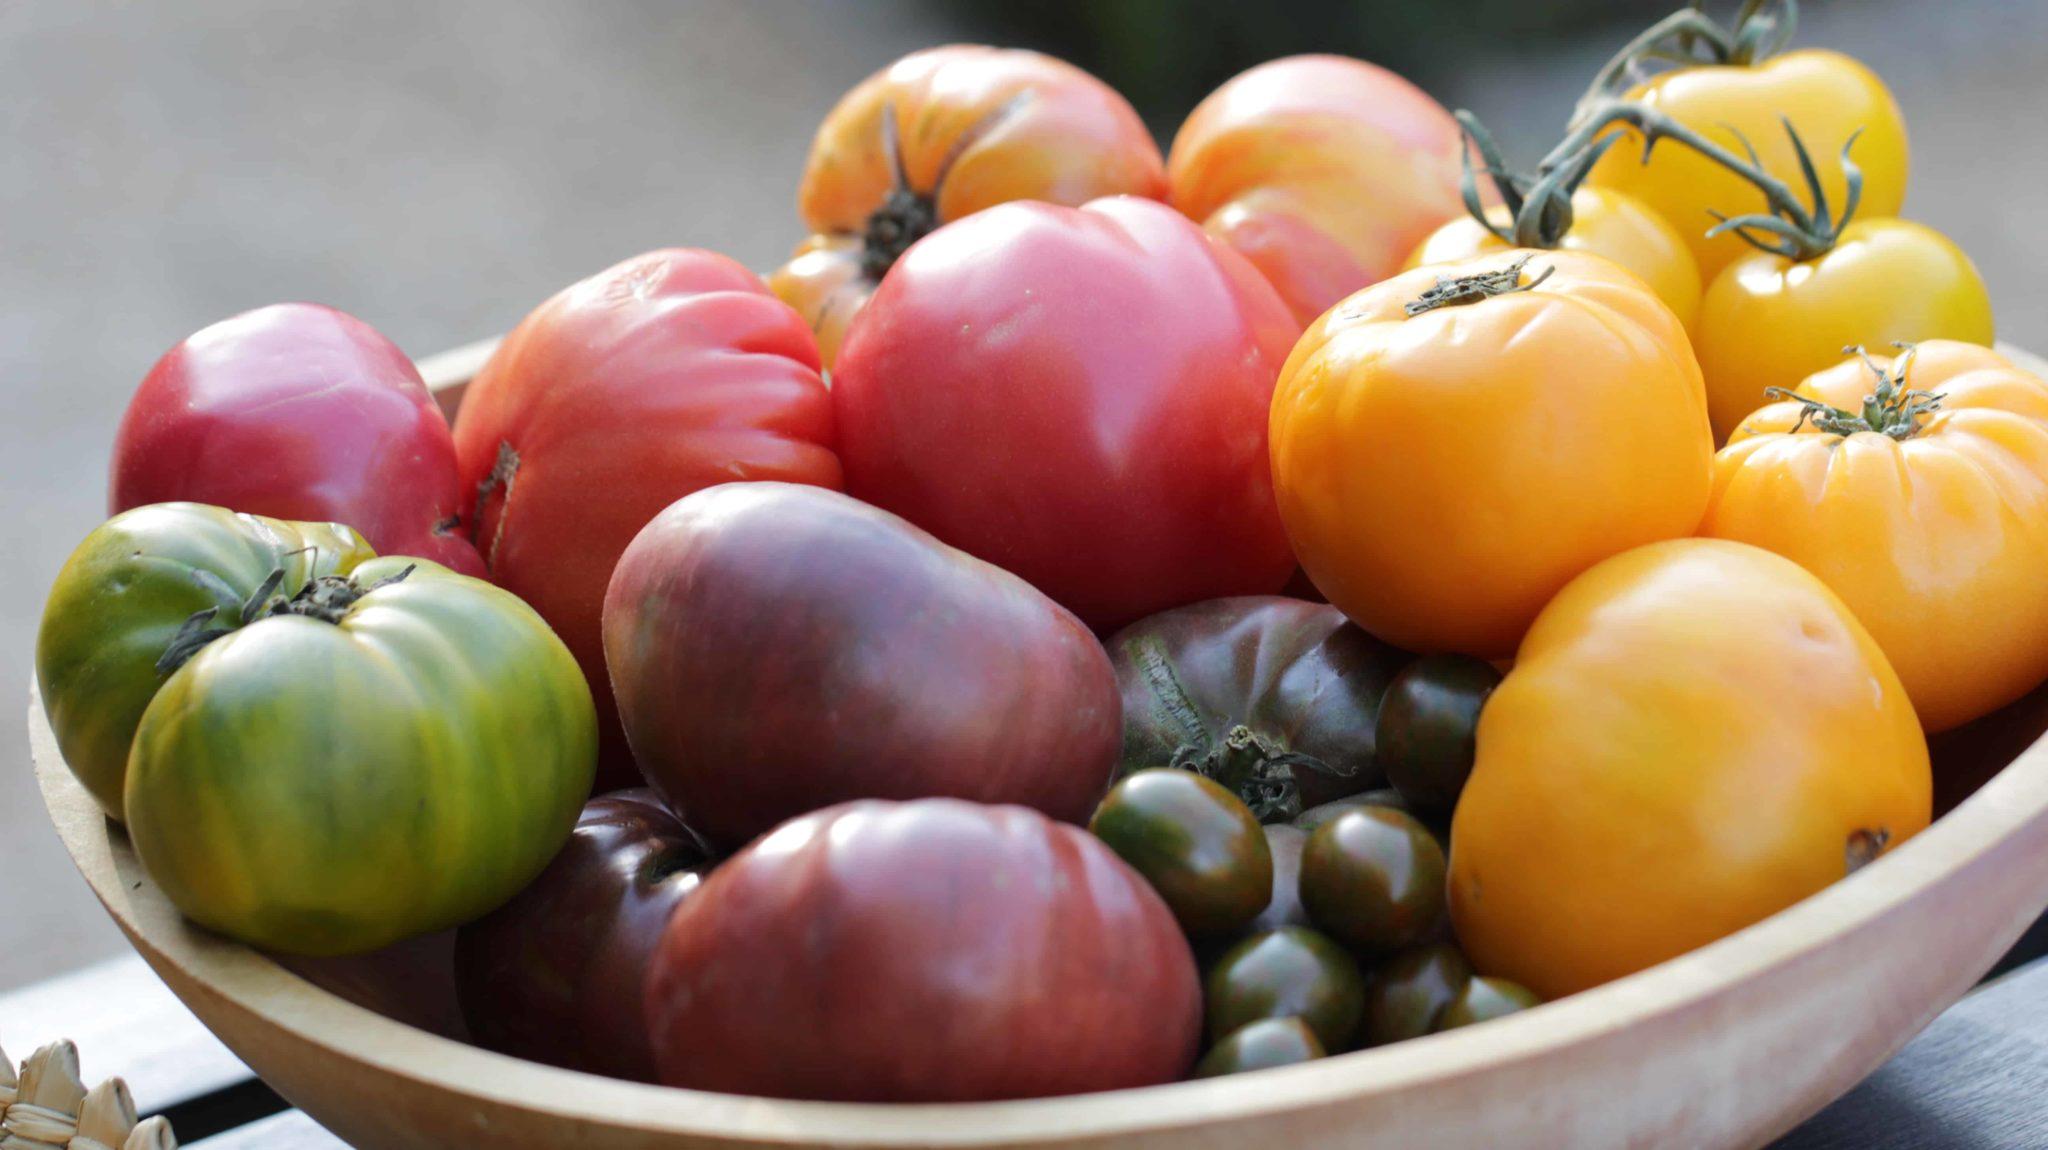 IBG07_Tomatoes_H1 copy